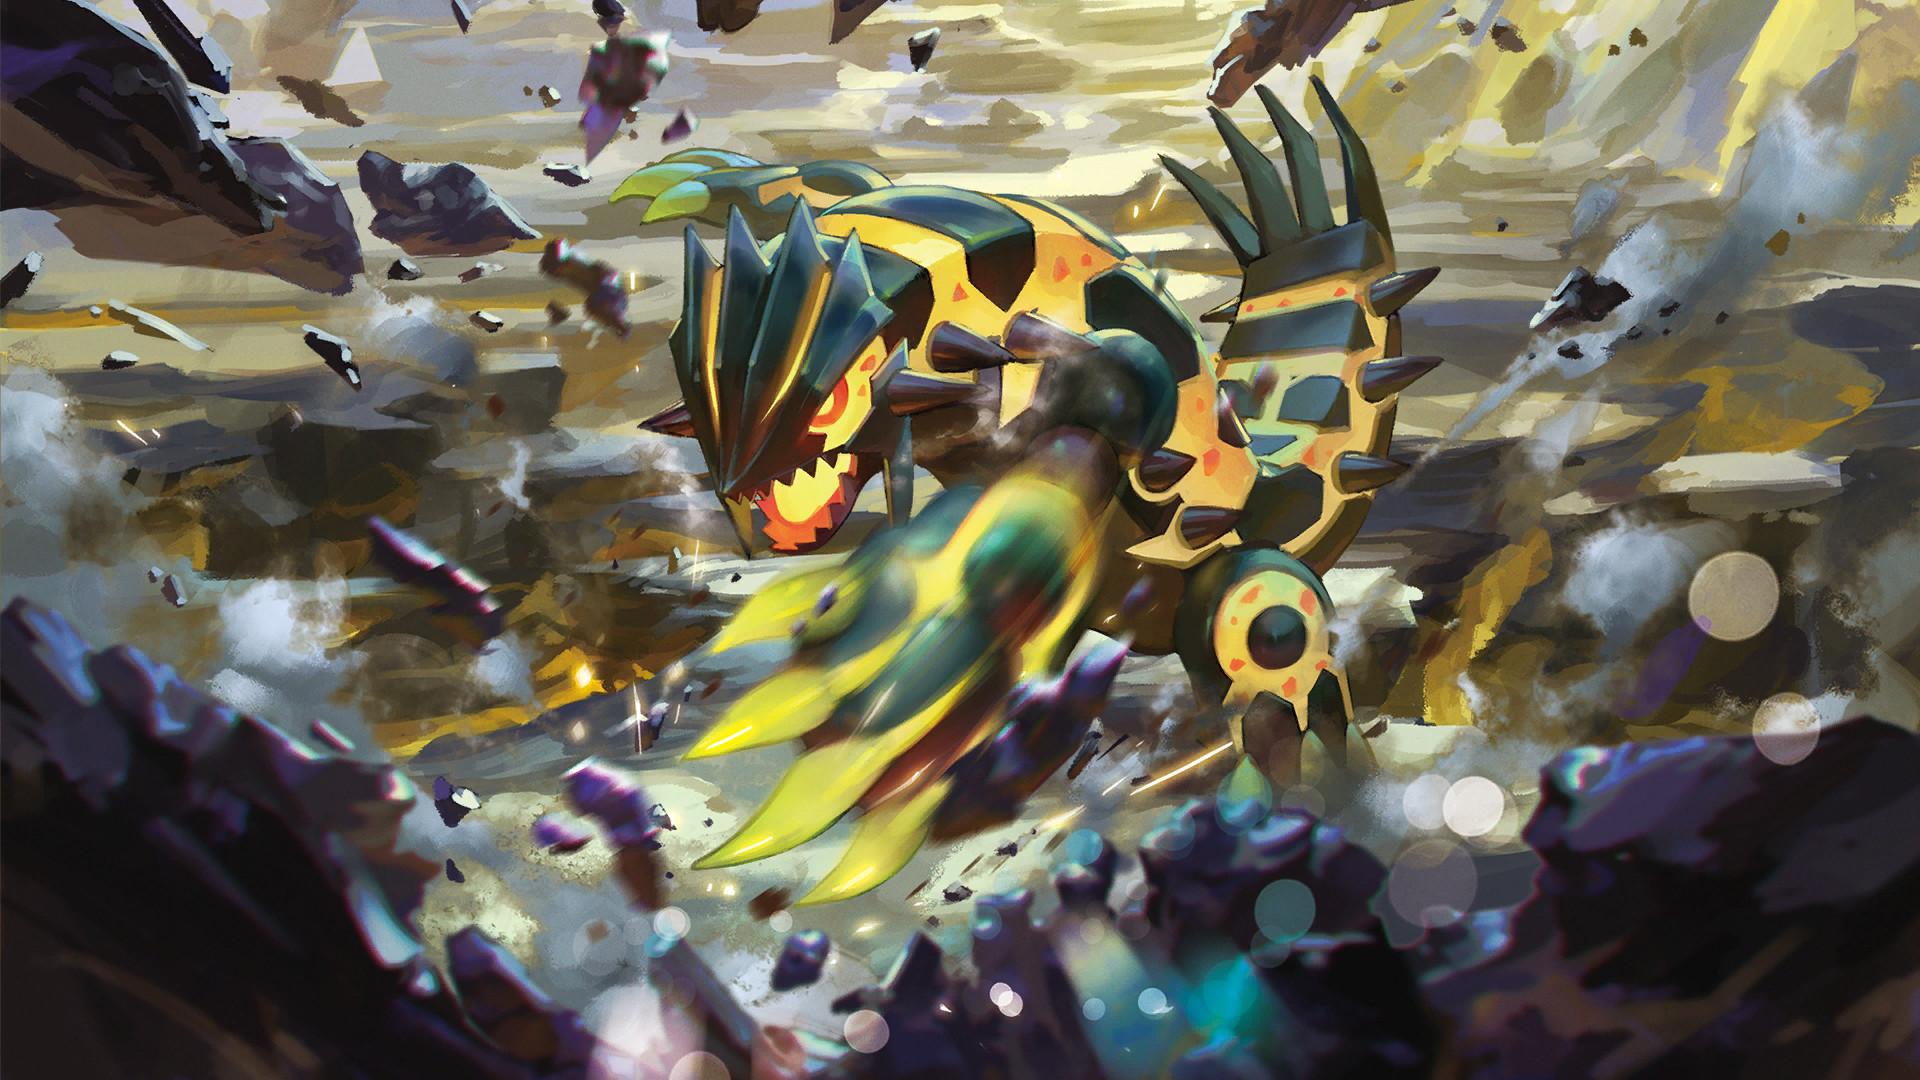 Image РShiny Mega Groudon РPokemon TCG XY Ancient Origins.png | Pok̩mon  Wiki | FANDOM powered by Wikia